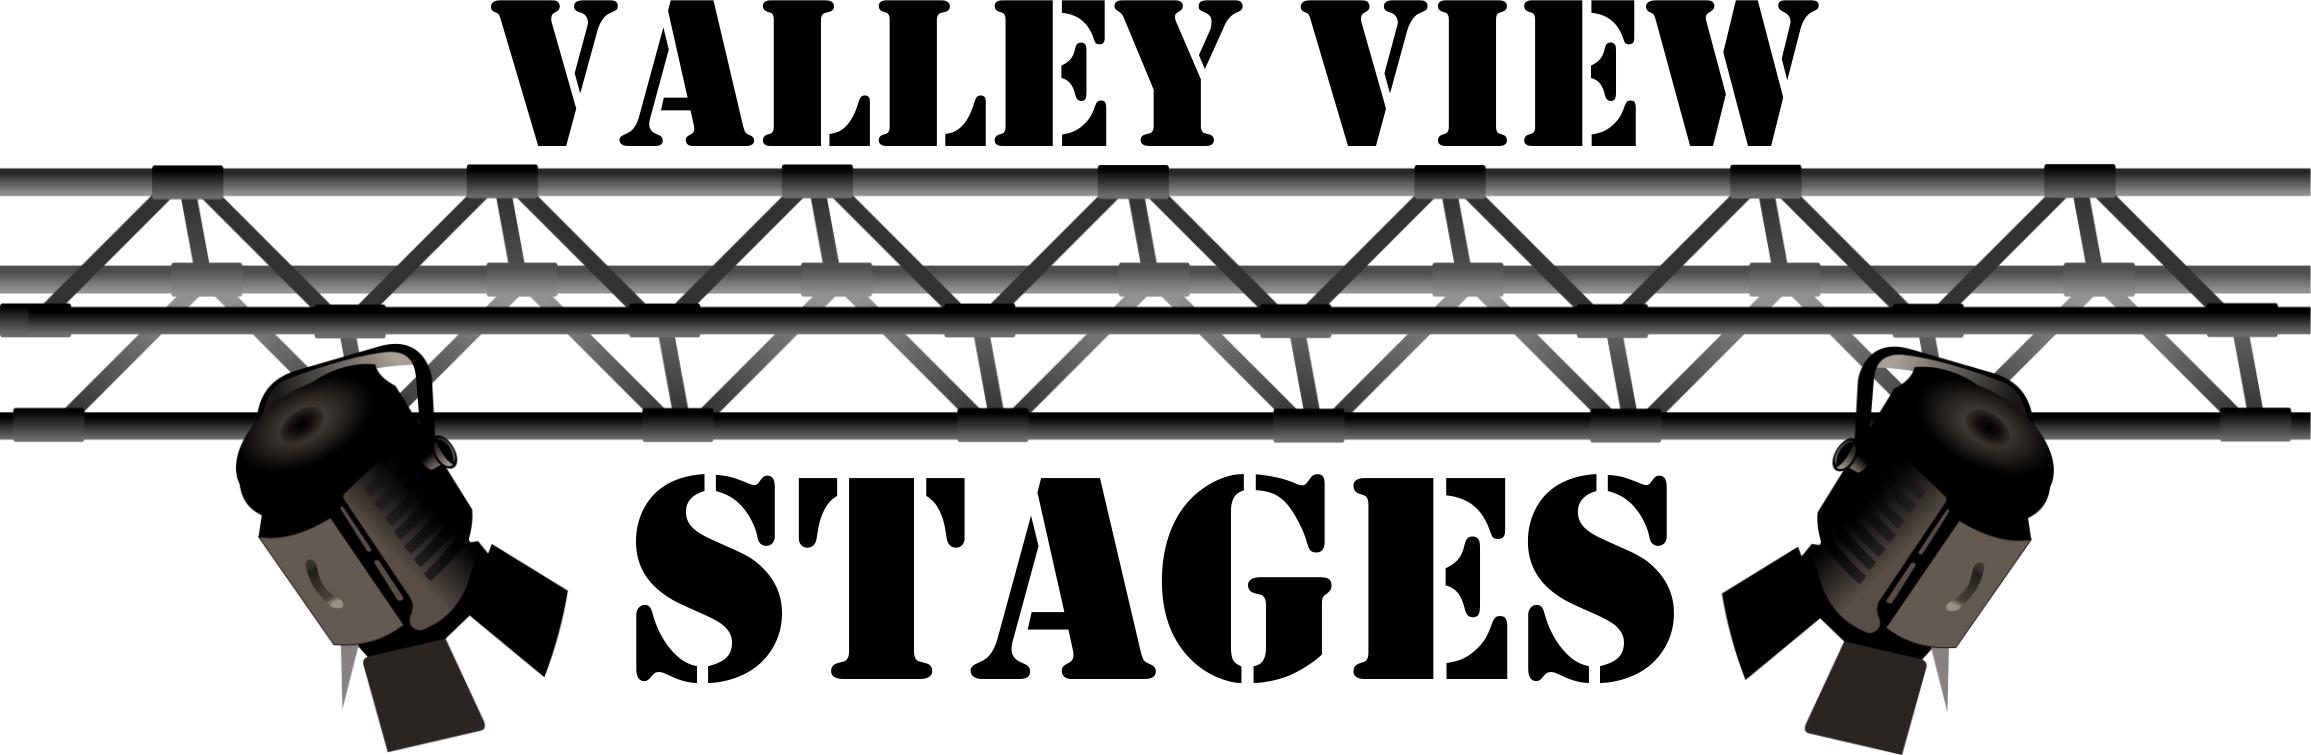 Stages Logos.jpg